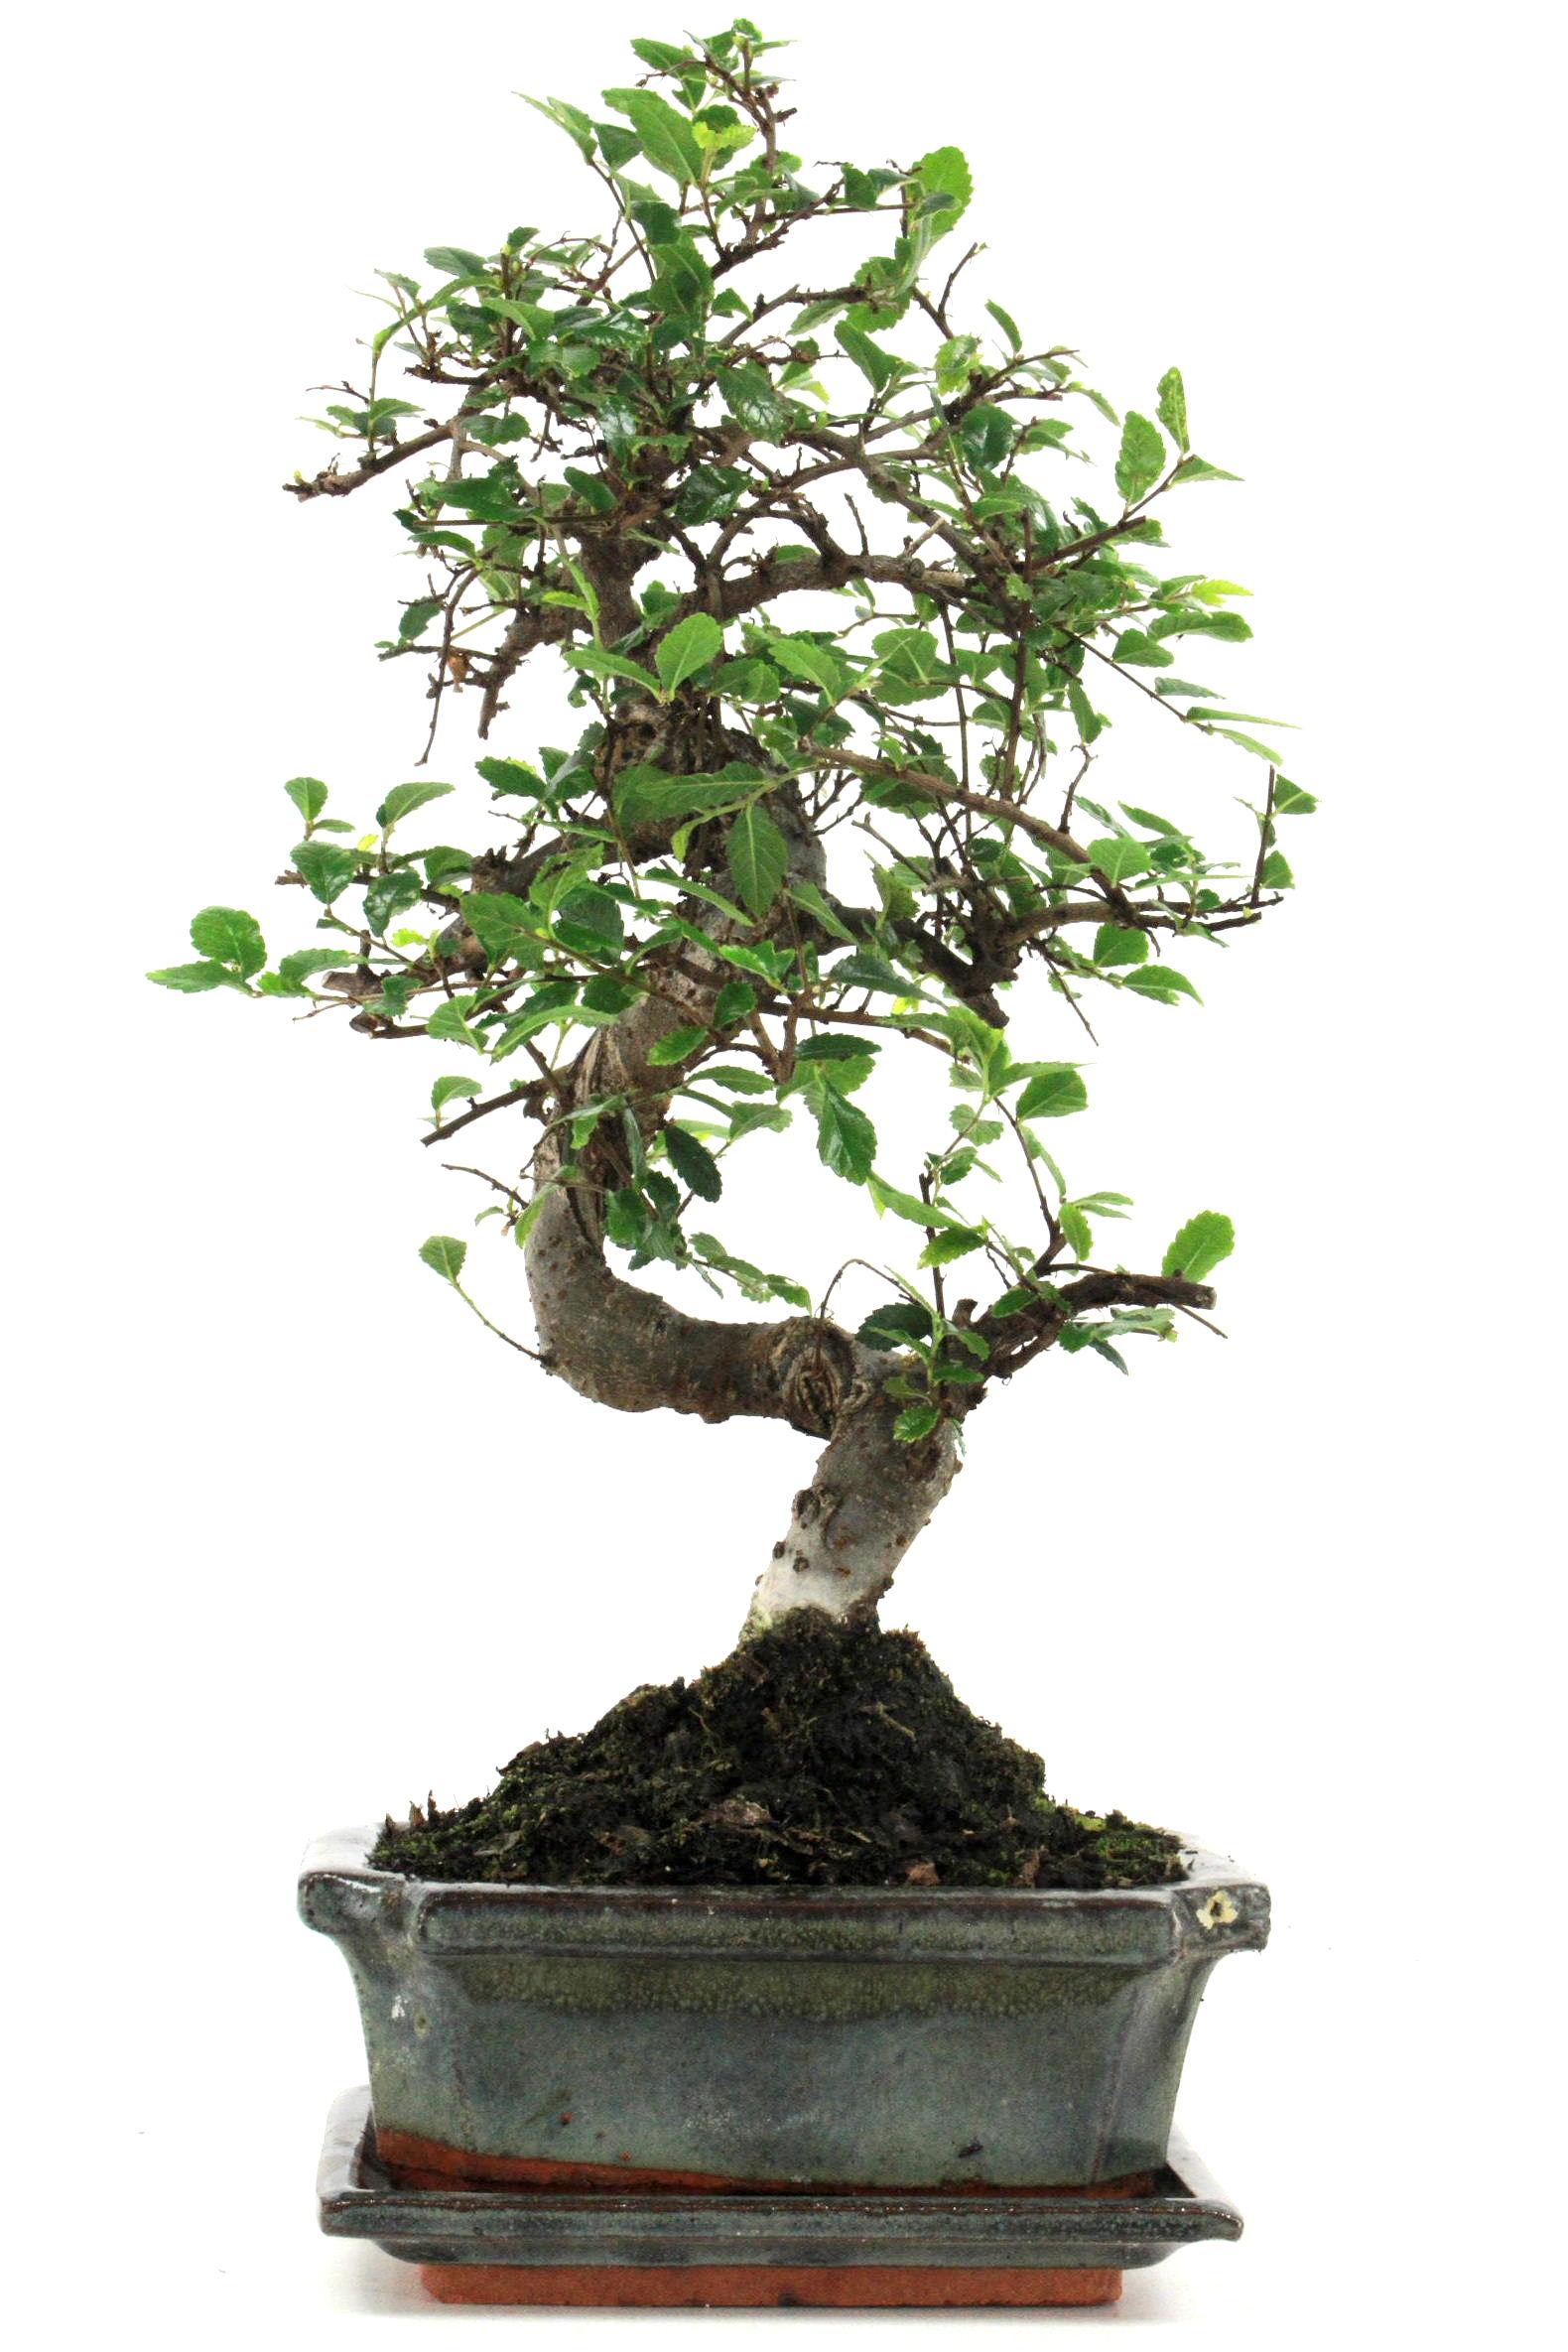 Bonsai chinesische ulme 30 35 cm g164 bei oyaki bonsai kaufen for Bonsai onlineshop